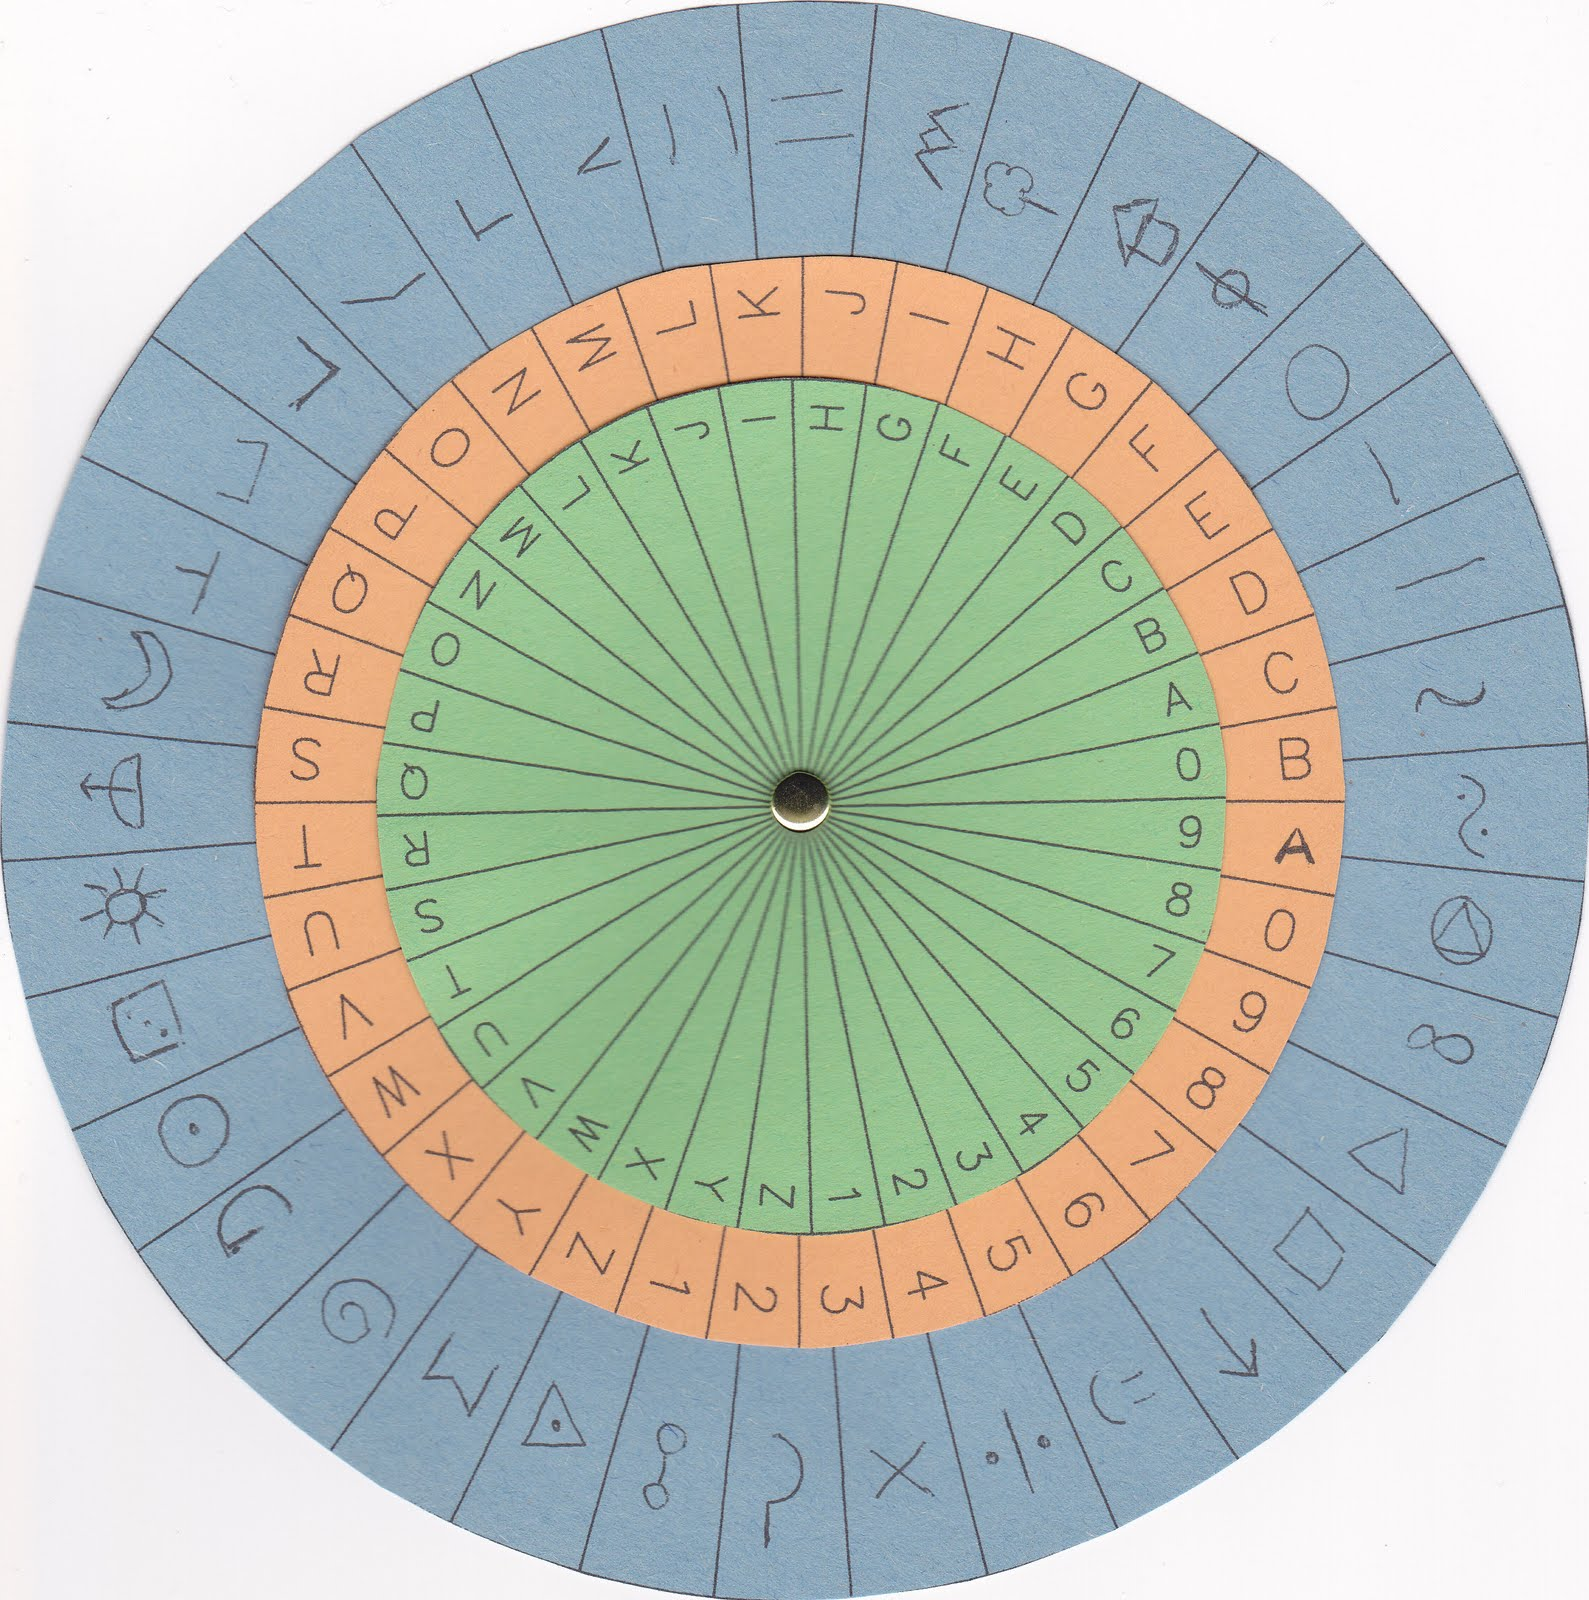 Clean image with printable decoder wheel